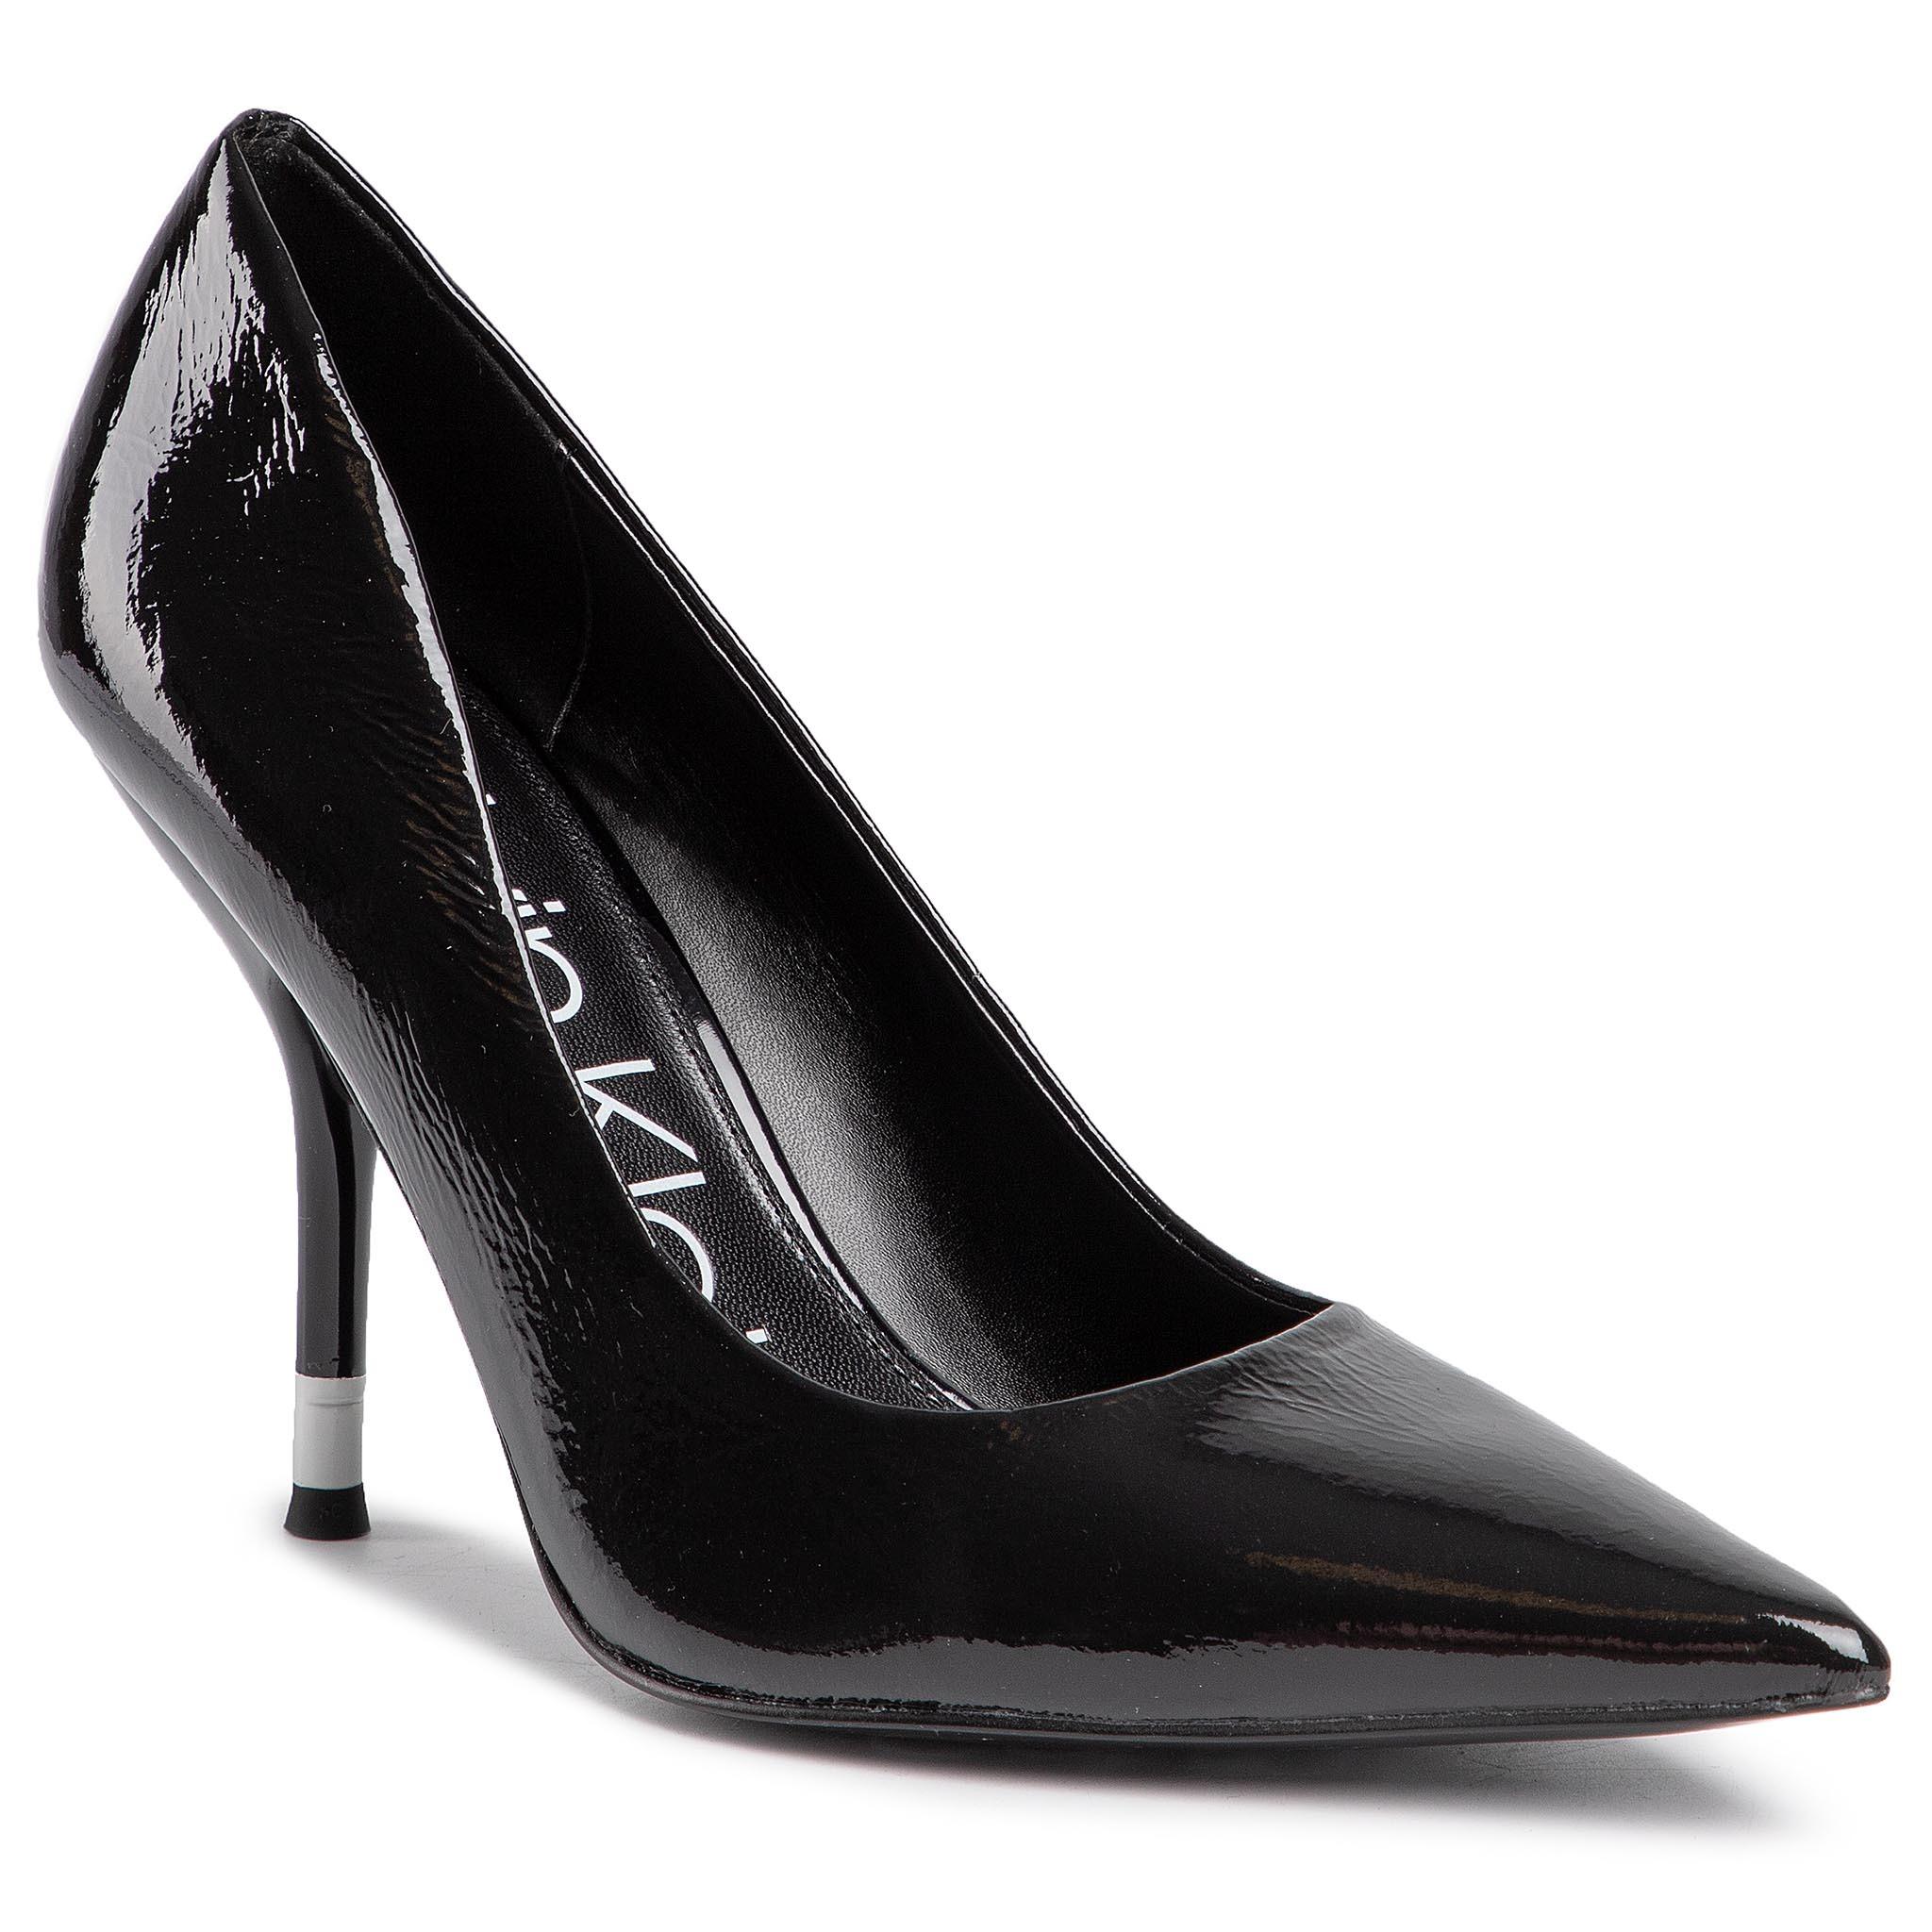 Pantofi cu toc subțire CALVIN KLEIN - Aliyah B4E6228 Black